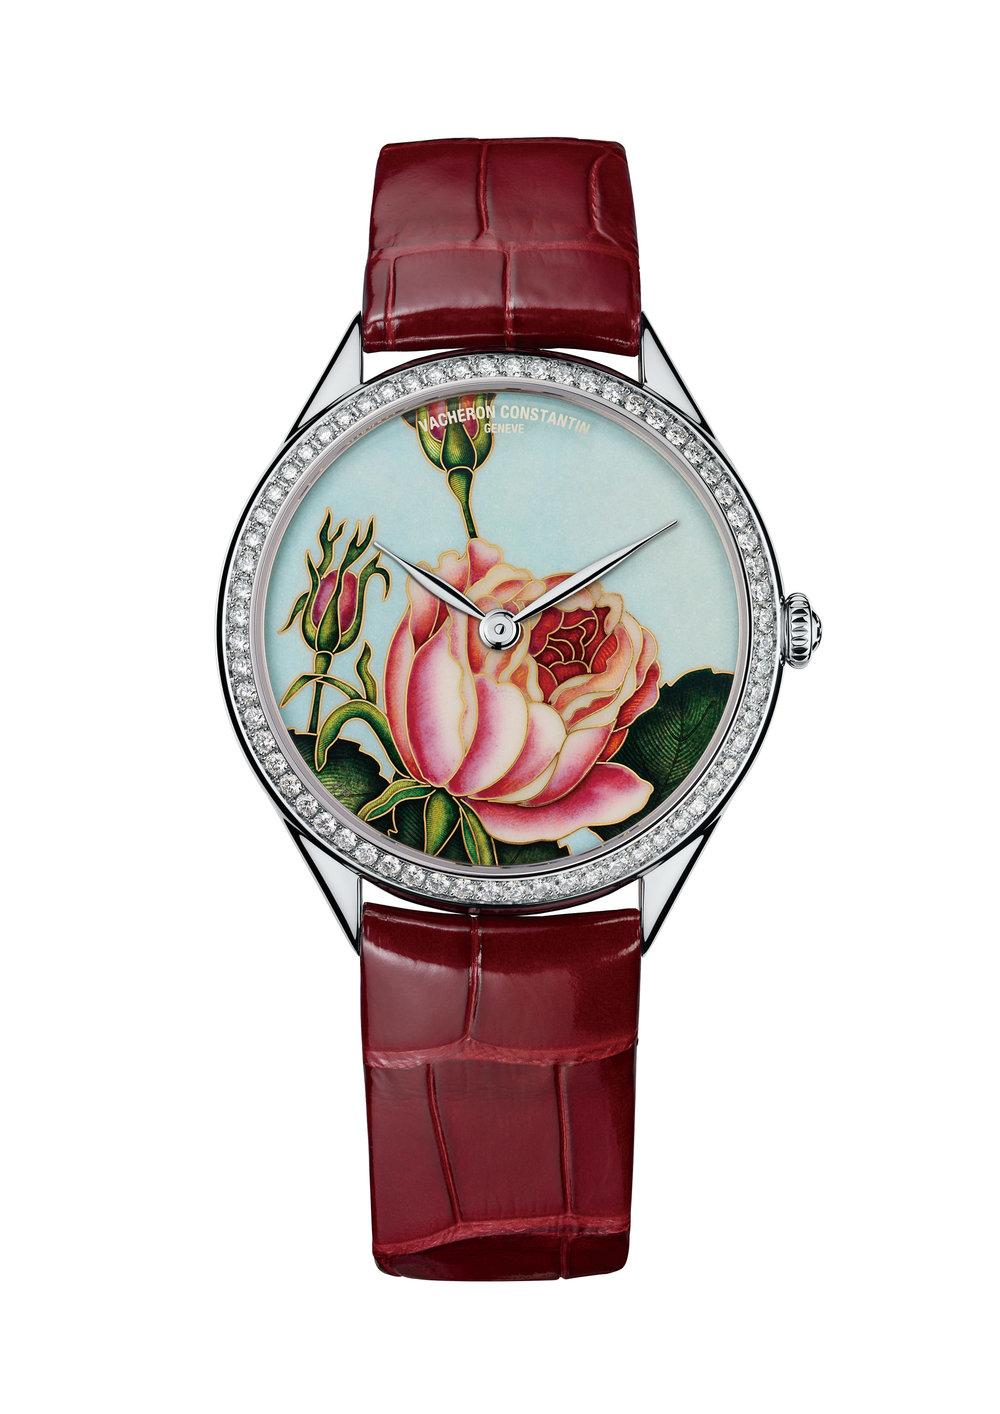 Vacheron Constantin  Métiers d'Art Florilège - Rosa Centifolia Watch Ref. 82550/000G-9919, $152,000  2013年日內瓦鐘錶展上,江詩丹唐首次推出藝術大師系列花之神殿腕錶,錶盤上鮮活嬌豔的花朵令許多女士為之陶醉。集合琺瑯、機刻雕花和寶石鑲嵌等工藝,錶盤上的花卉從花瓣到葉片,從花莖到花蕊,無不描畫的細緻入微,在錶圈上60顆明亮式切割的鑽石的映襯下,宛如一幅大師級的畫作。防水30米,動力儲存約65小時,限量20枚。  At Palladio, (604) 685-3885, vacheron-constantin.com